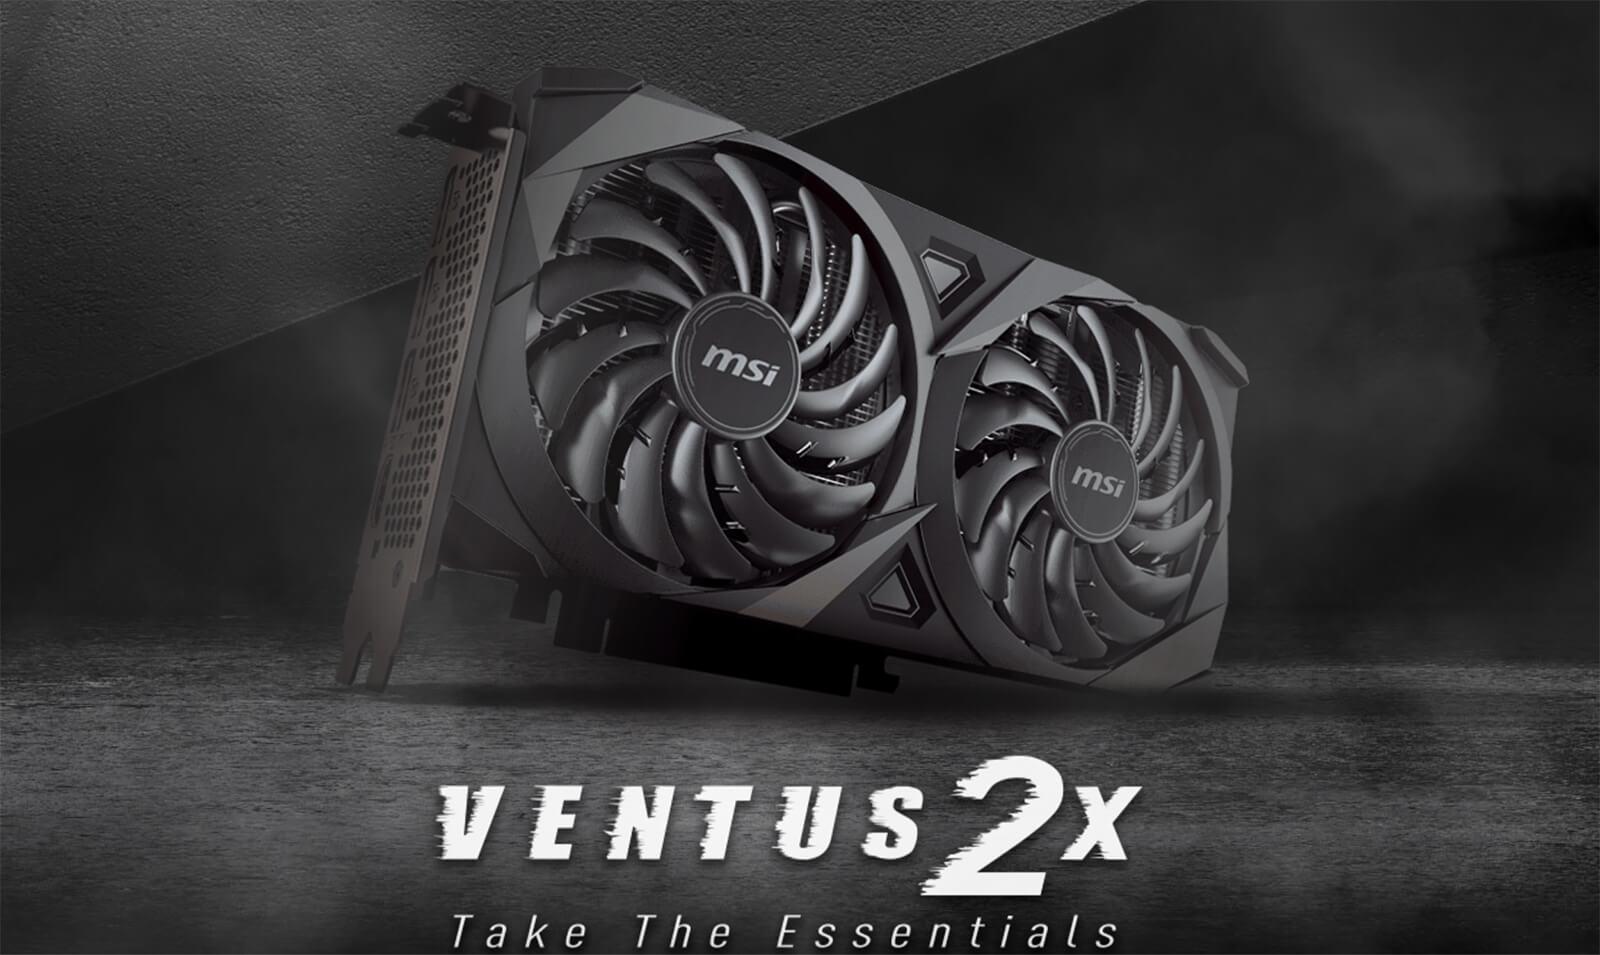 Msi Geforce Rtx™ 3060 Ventus 2x 12g Oc Features